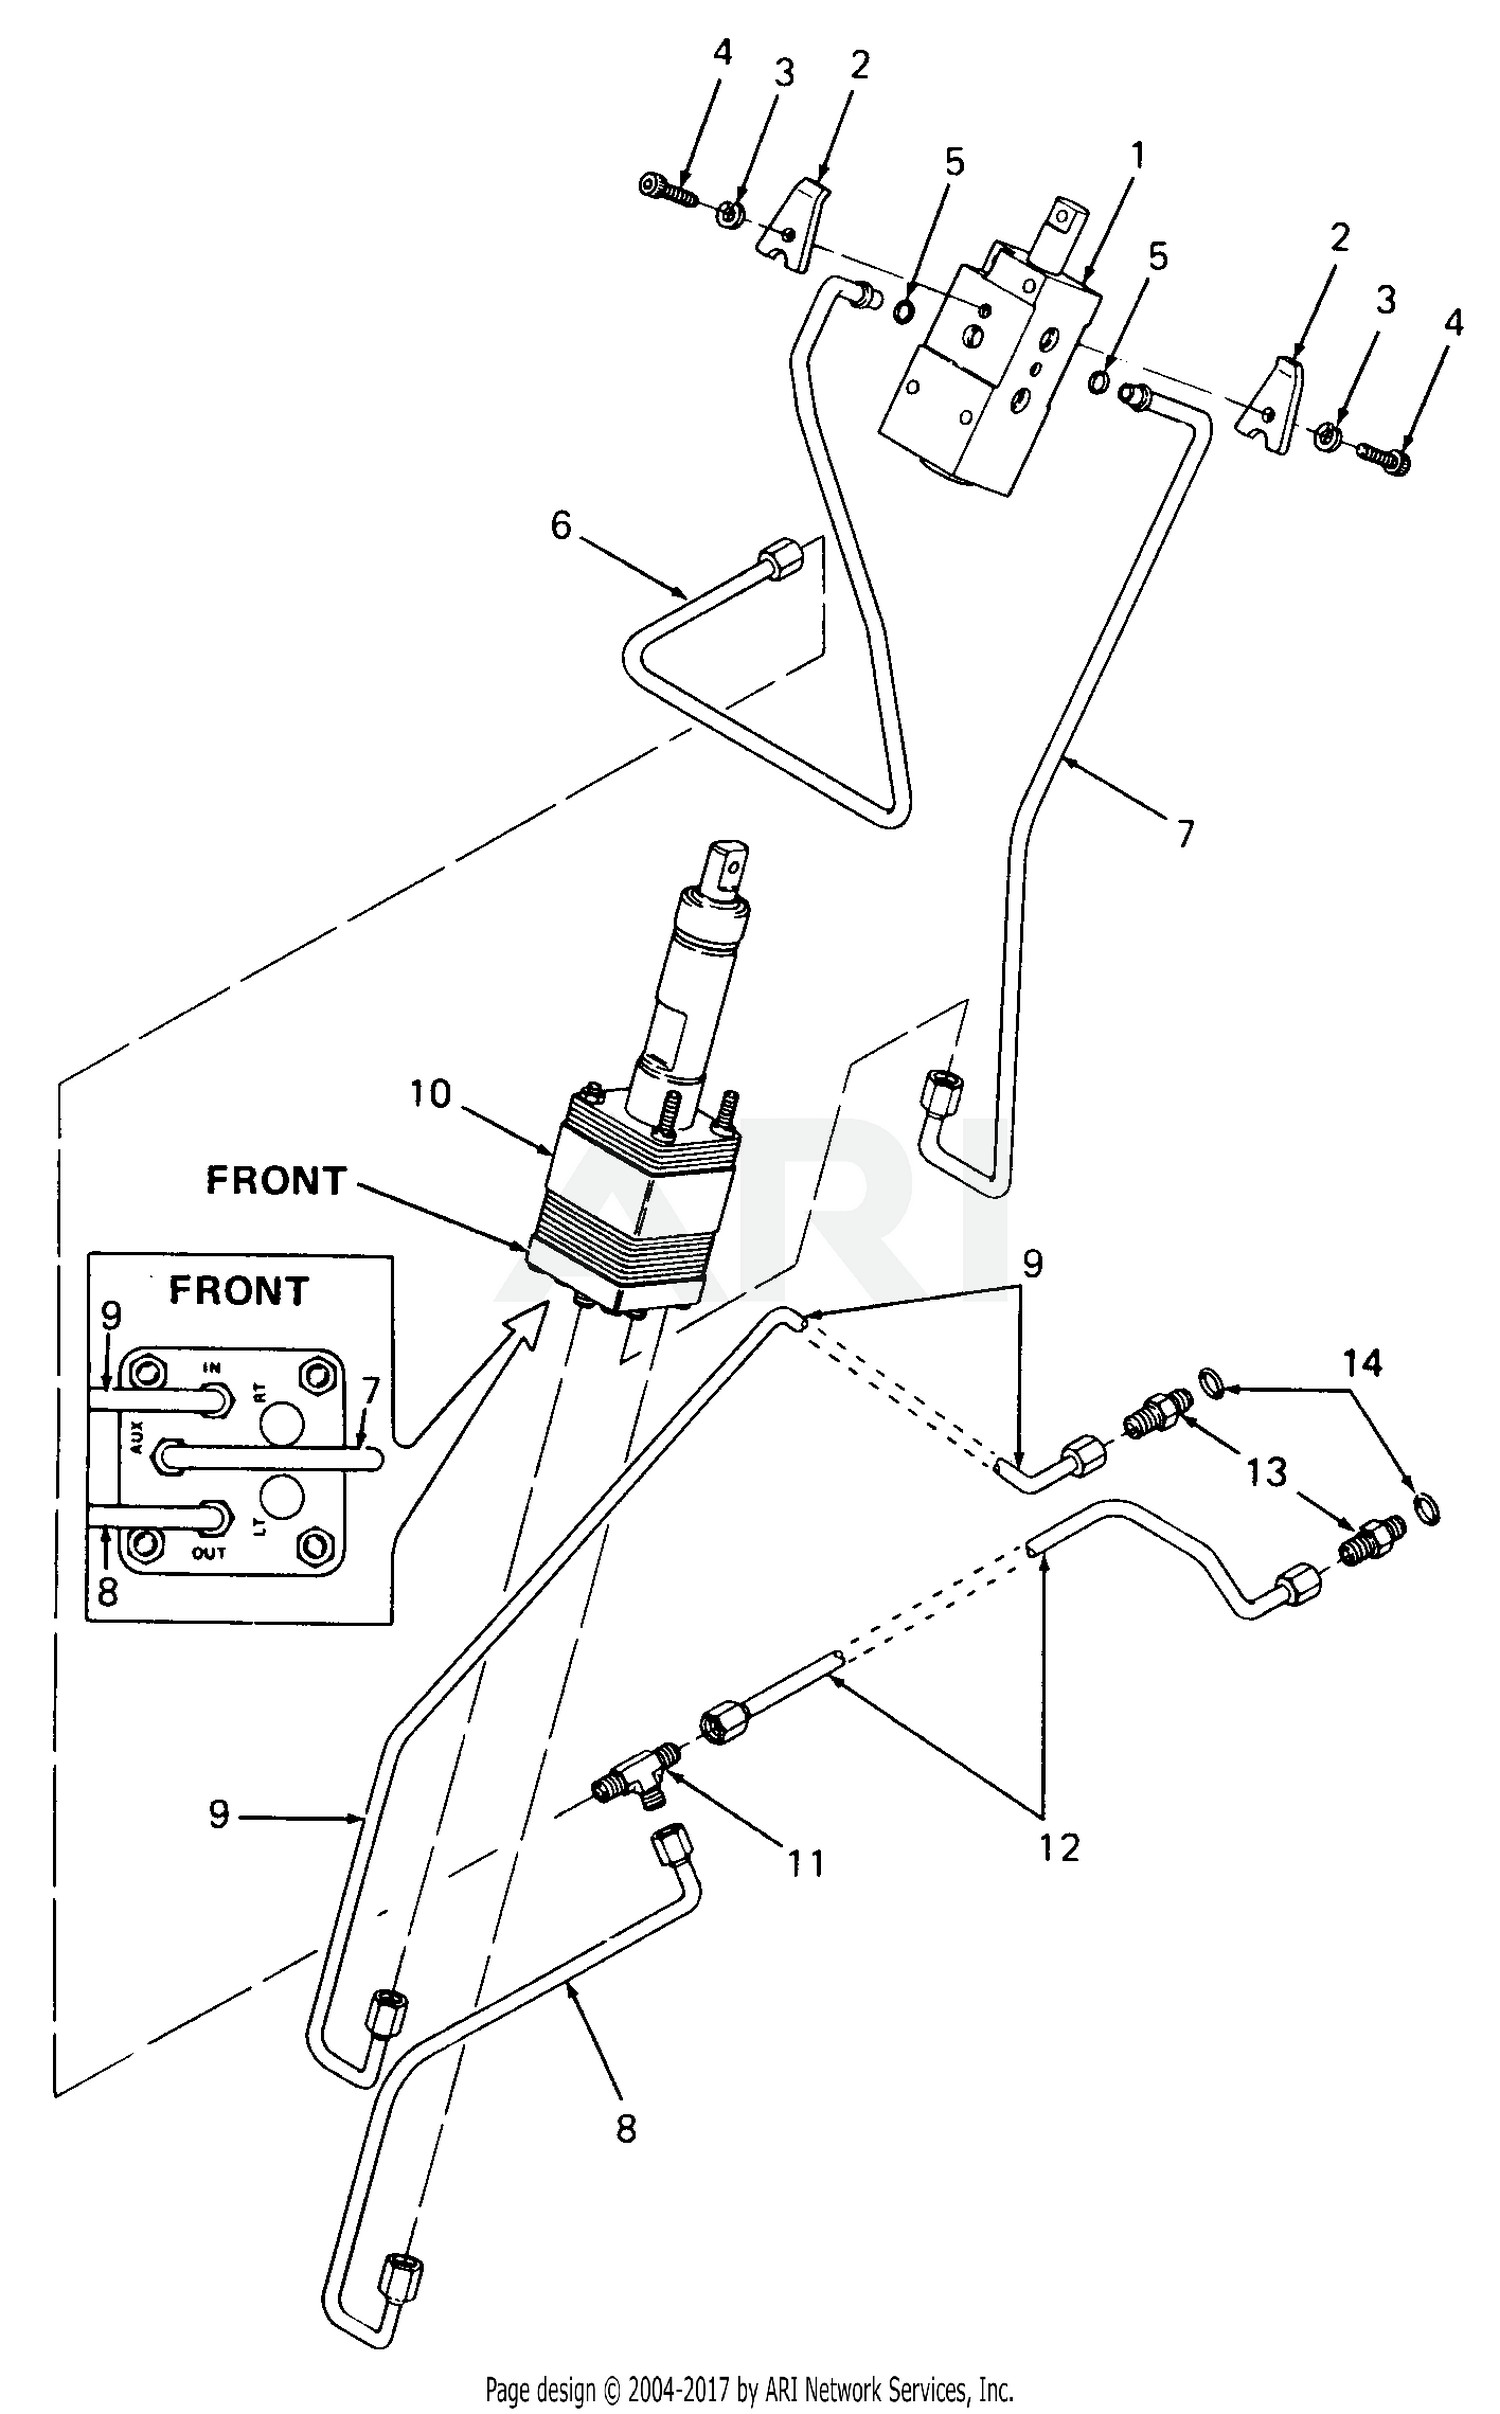 Power Steering Pump Parts Diagram Cub Cadet Parts Diagrams Cub Cadet 1782 S N 800 000 821 059 140 Of Power Steering Pump Parts Diagram